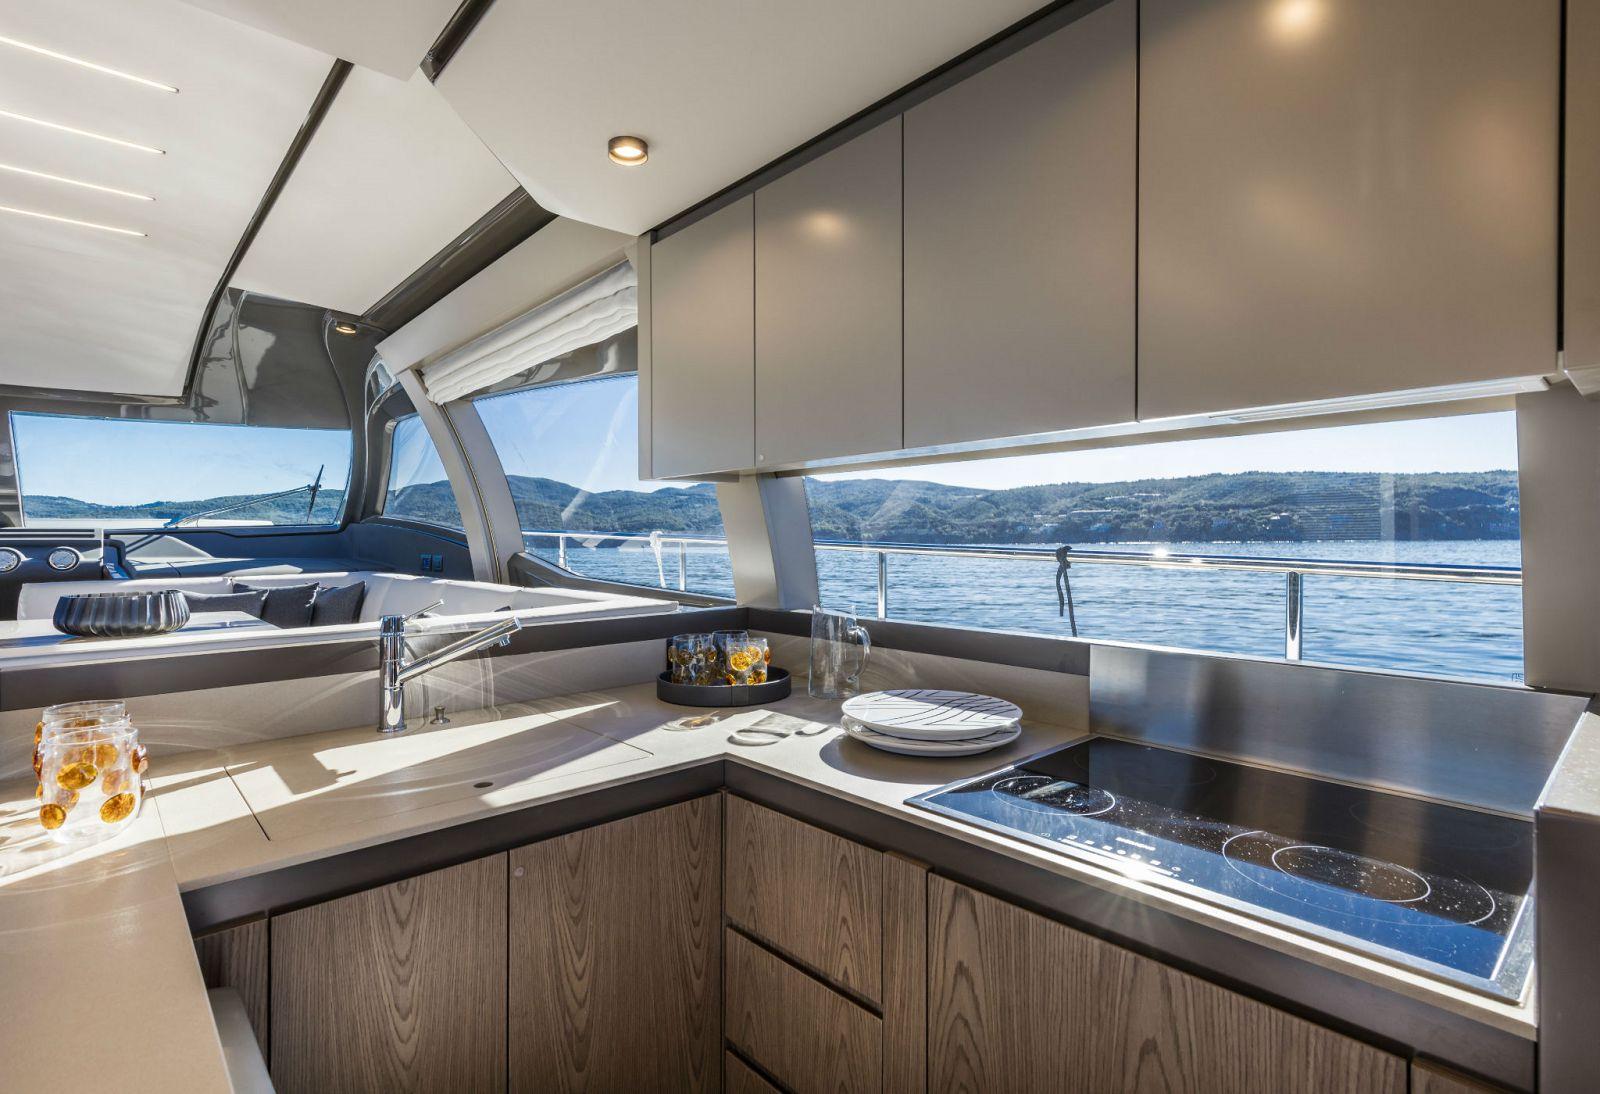 Ferretti Yachts 550 Galley - New Luxury Yacht for Sale >